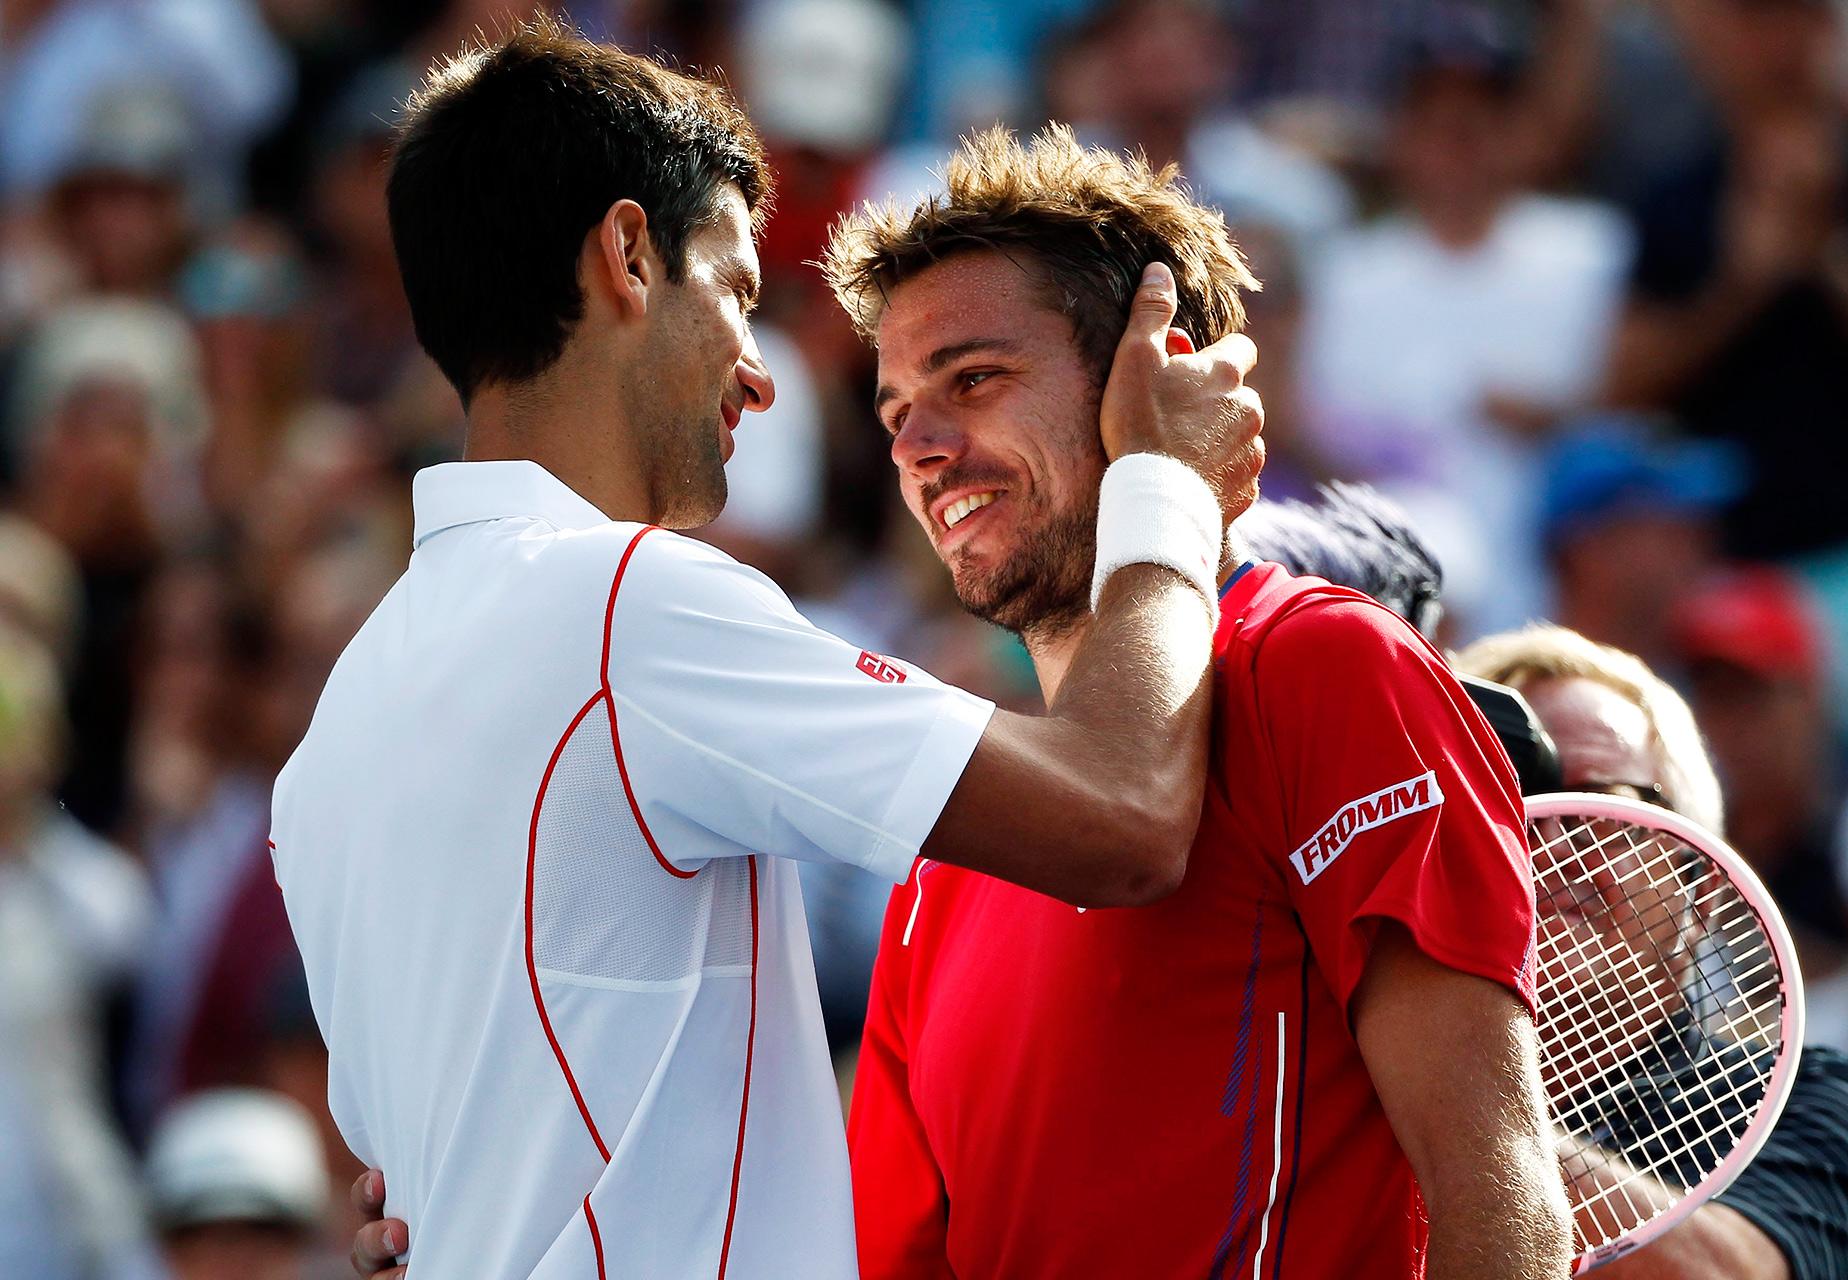 Novak Djokovic, Stanislas Wawrinka